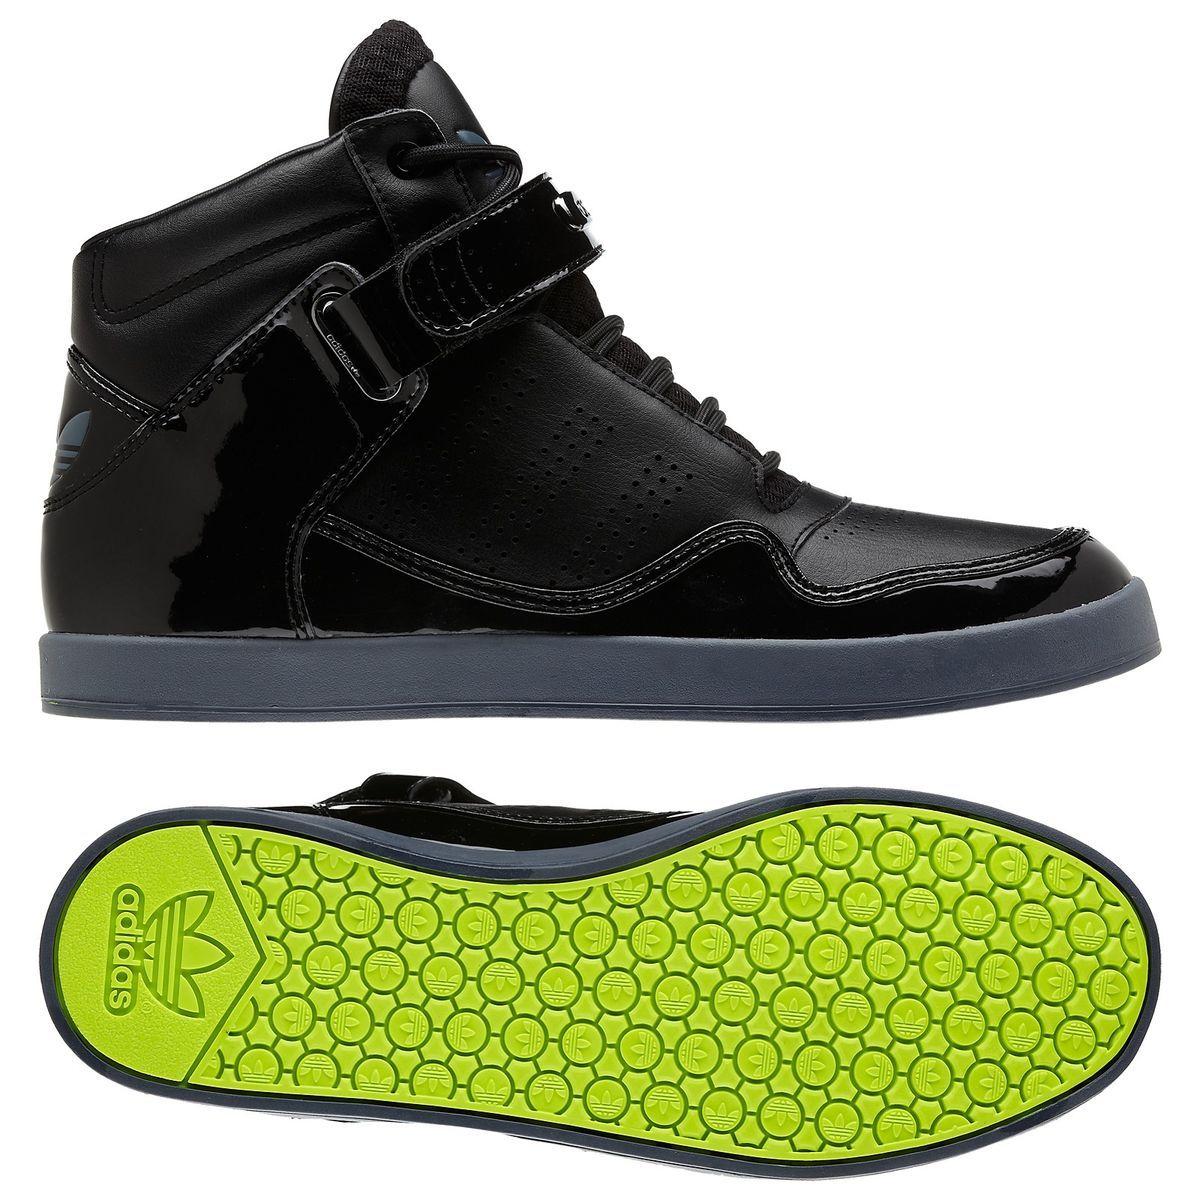 Cumplir gatito Babosa de mar  Adidas Adi Rise AR 2 0 Black Lead Electricity Velcro Strap Mid Men |  Breathable shoes men, Mens velcro shoes, Adidas shoes originals